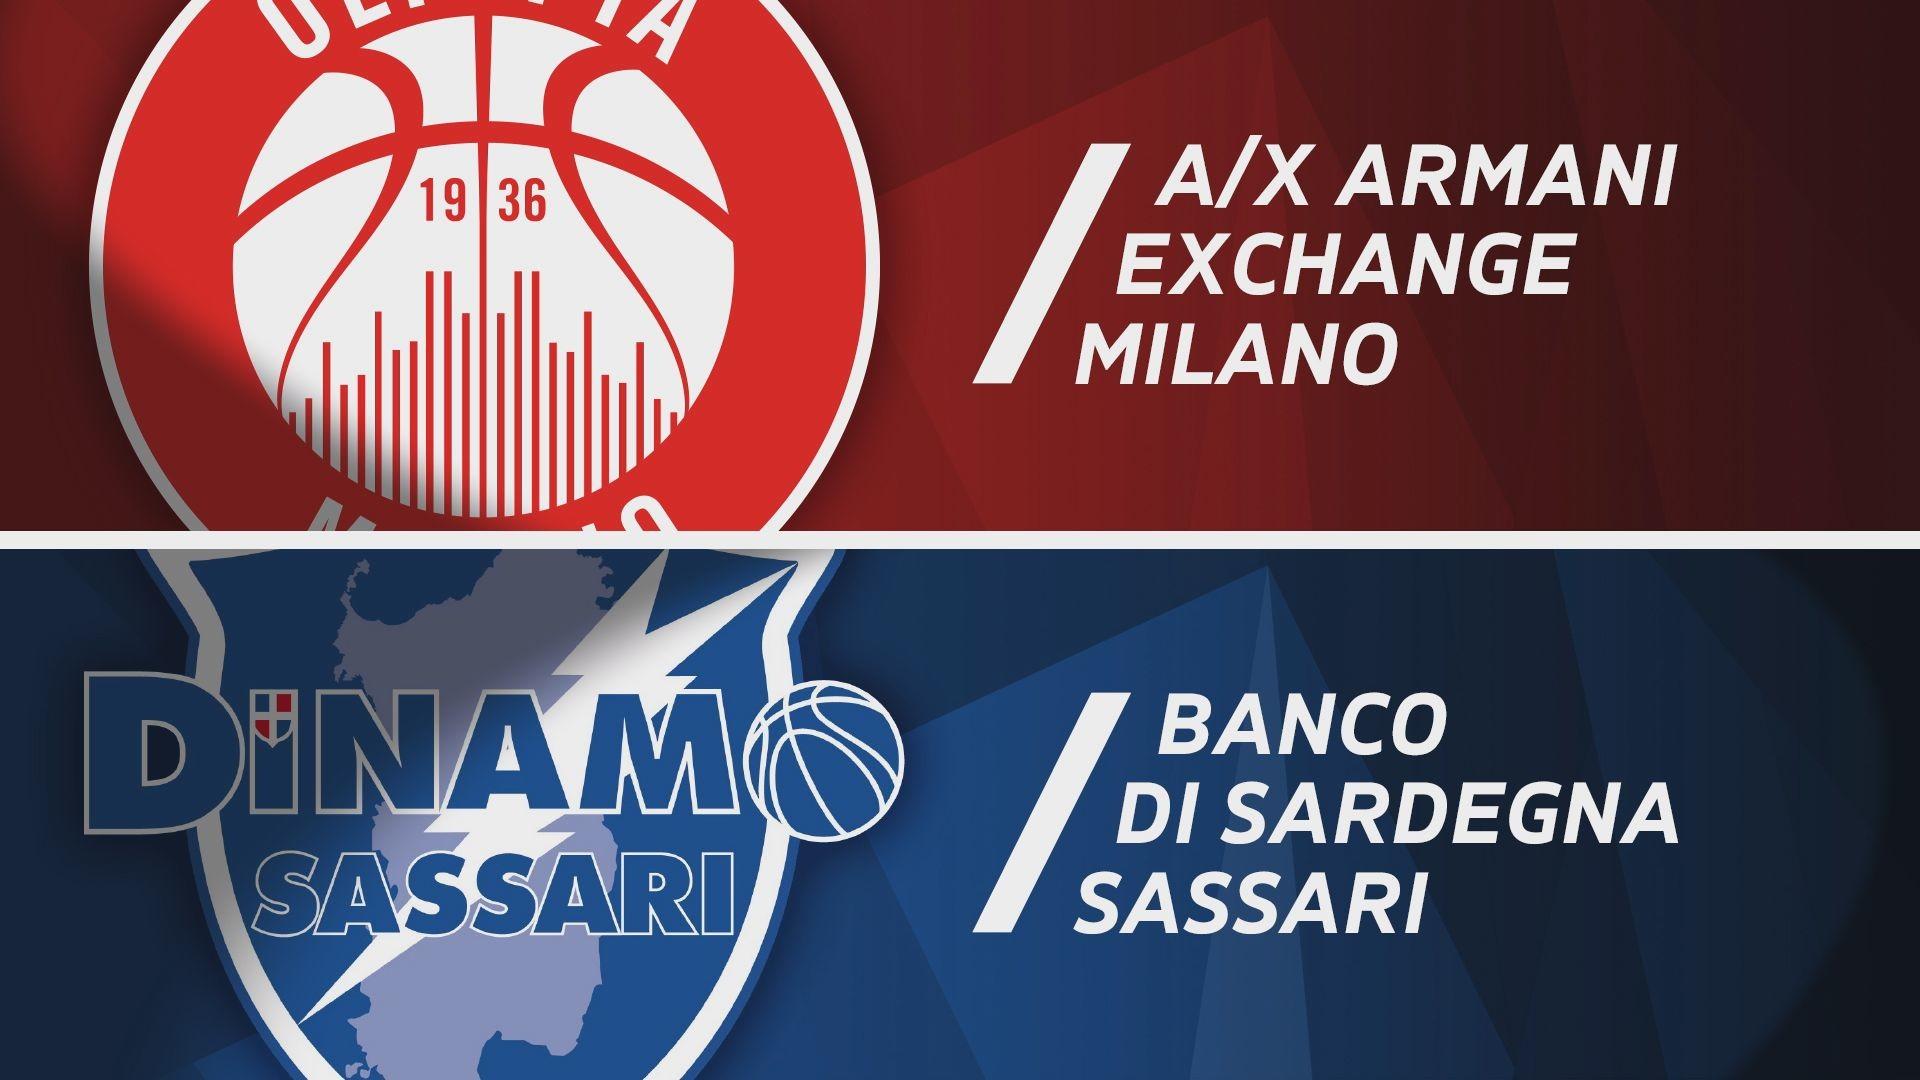 A|X Armani Exchange Milano - Banco di Sardegna Sassari 102-86